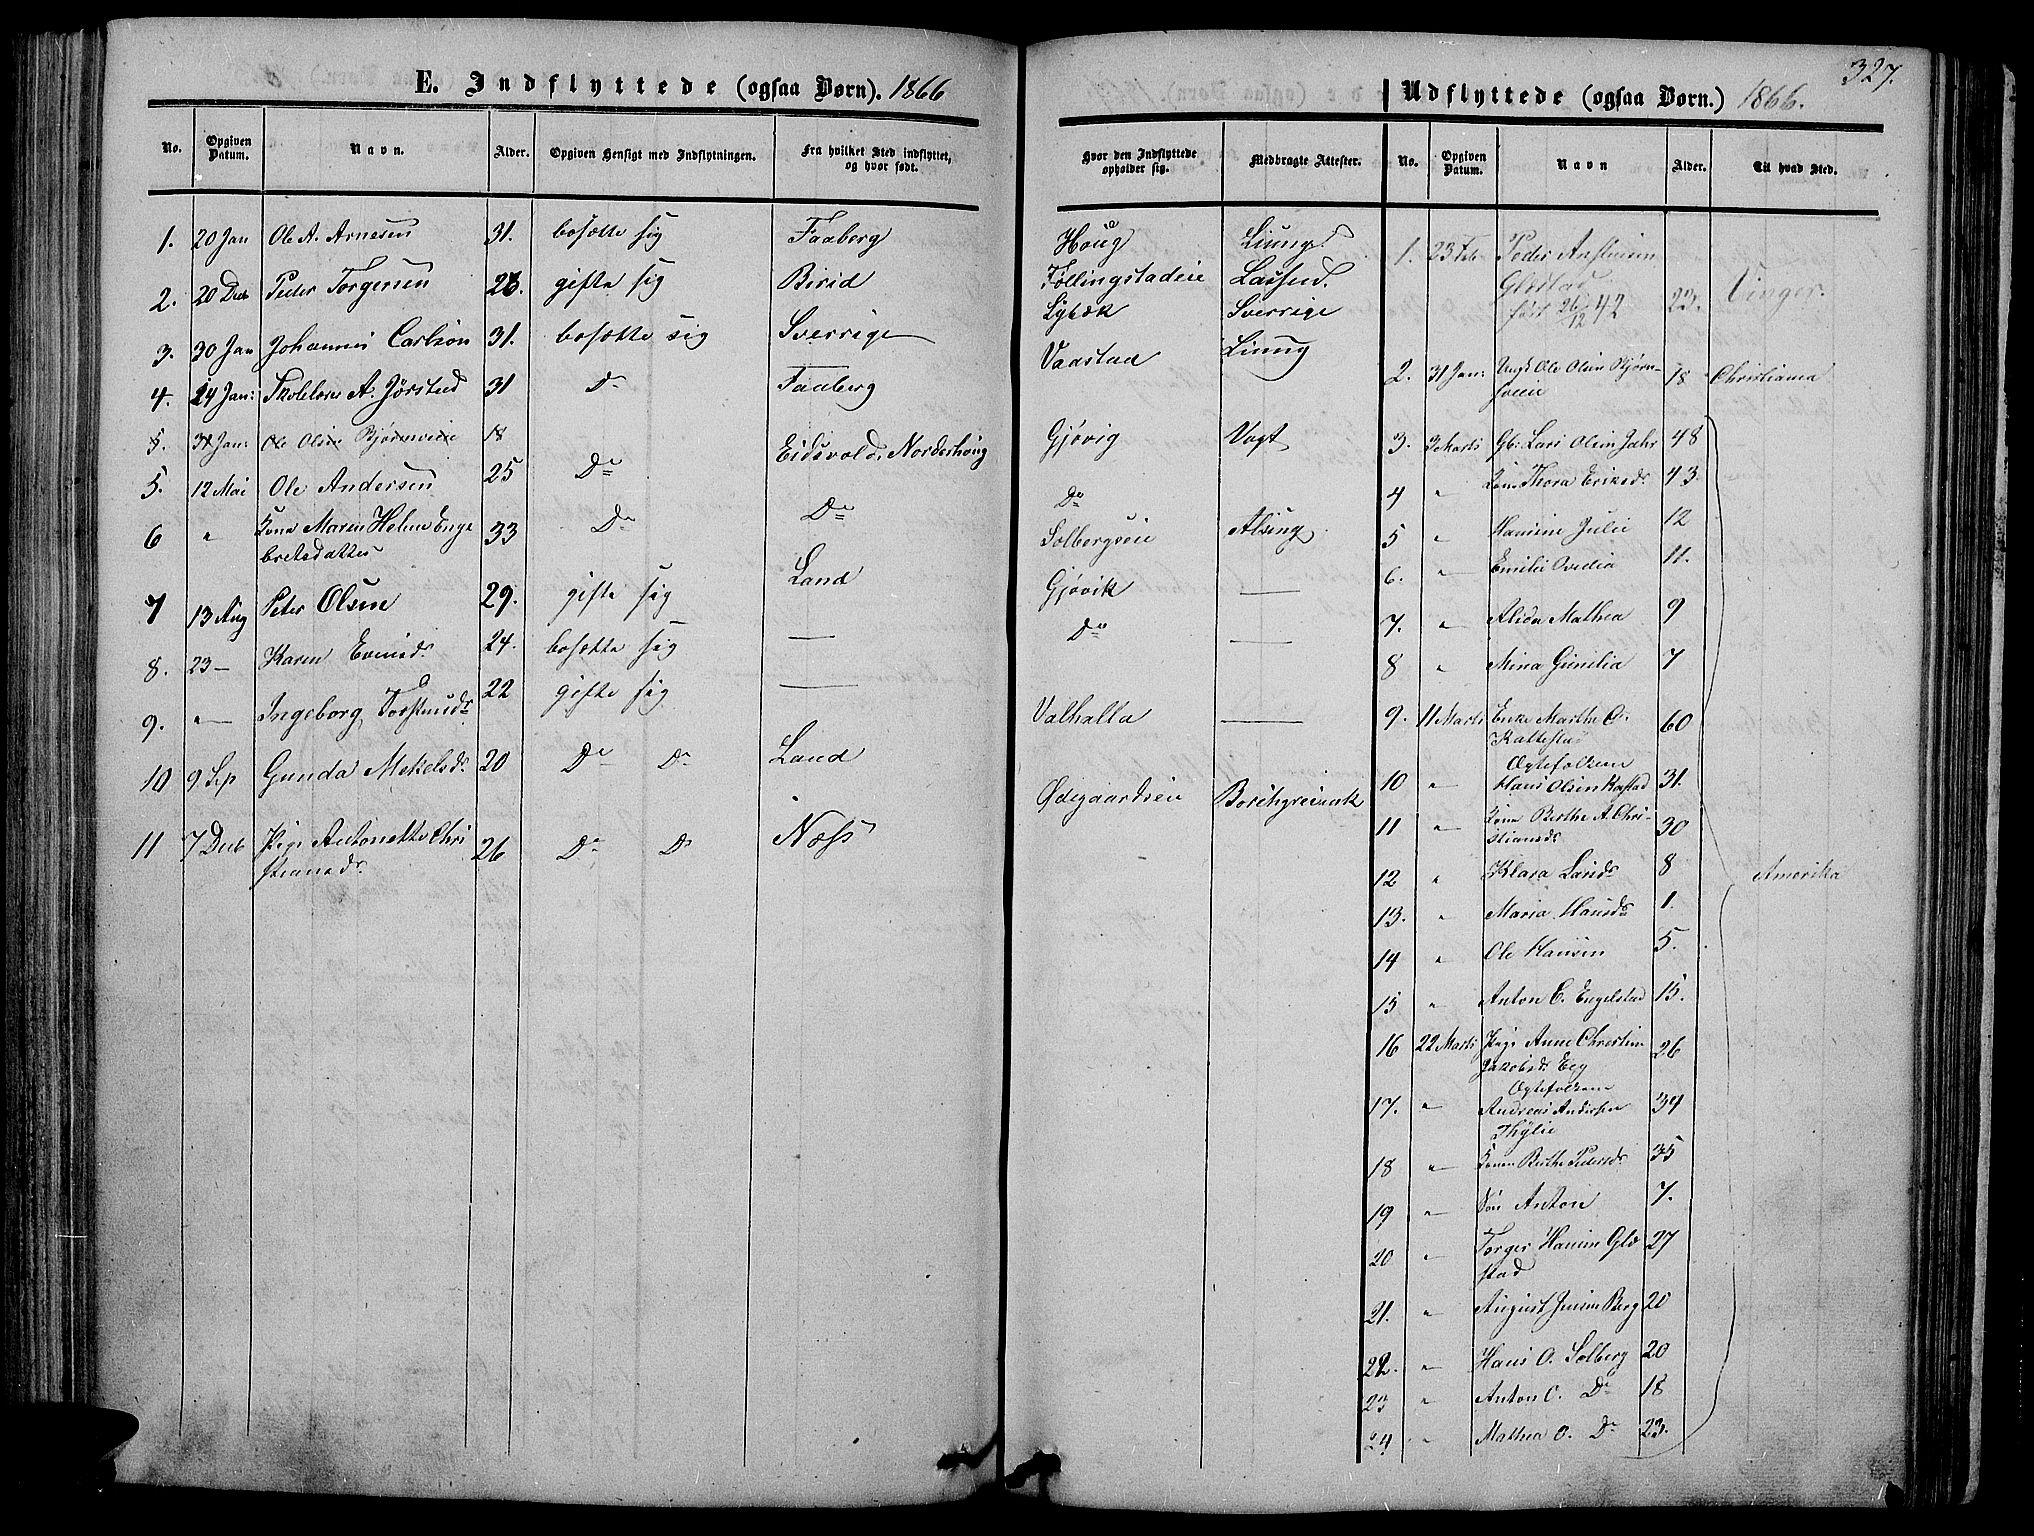 SAH, Vardal prestekontor, H/Ha/Hab/L0005: Klokkerbok nr. 5, 1854-1868, s. 327